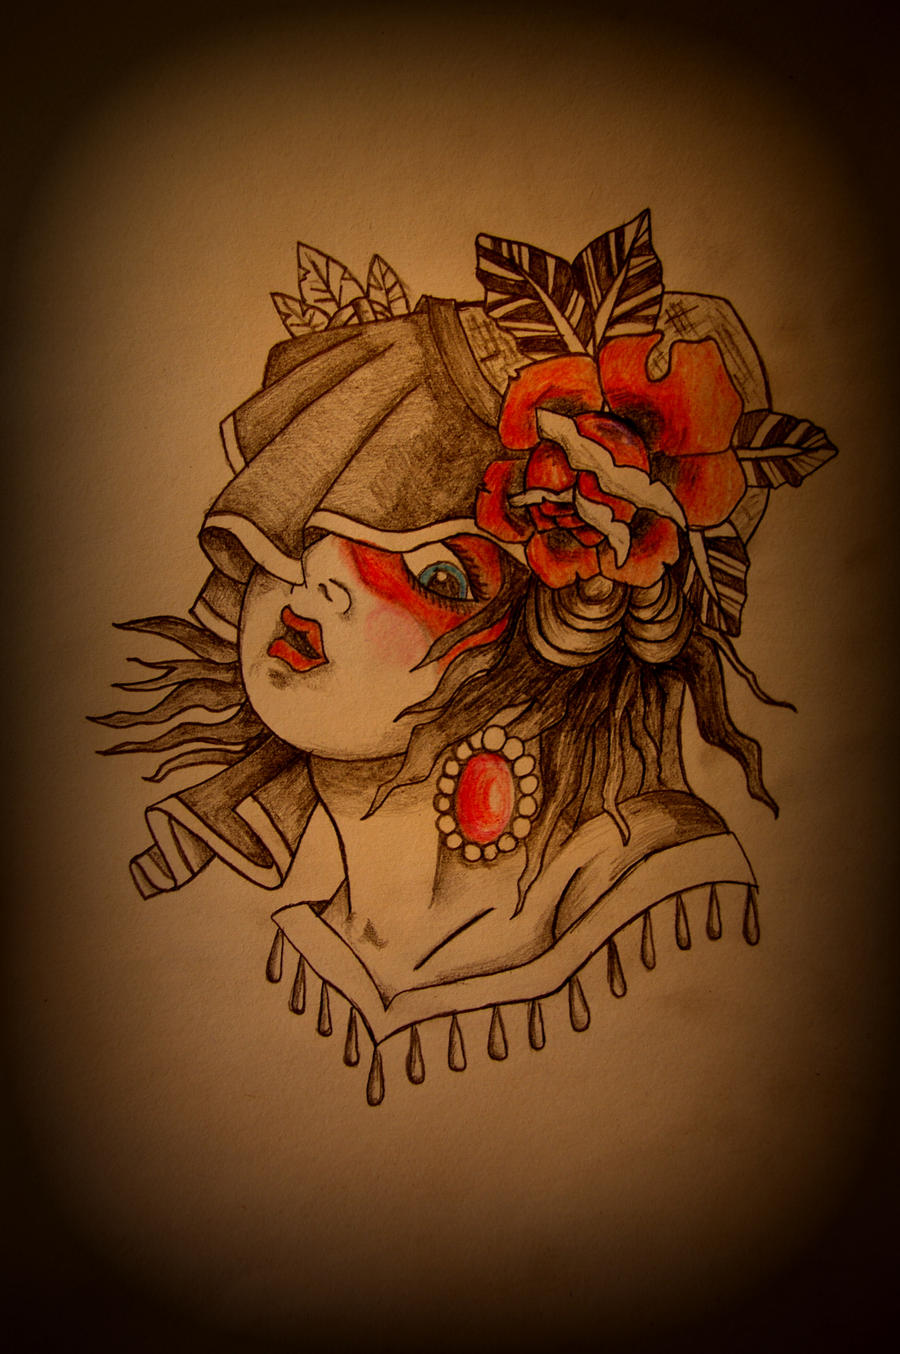 traditional gypsy tattoo flash by battered n bruised on deviantart. Black Bedroom Furniture Sets. Home Design Ideas